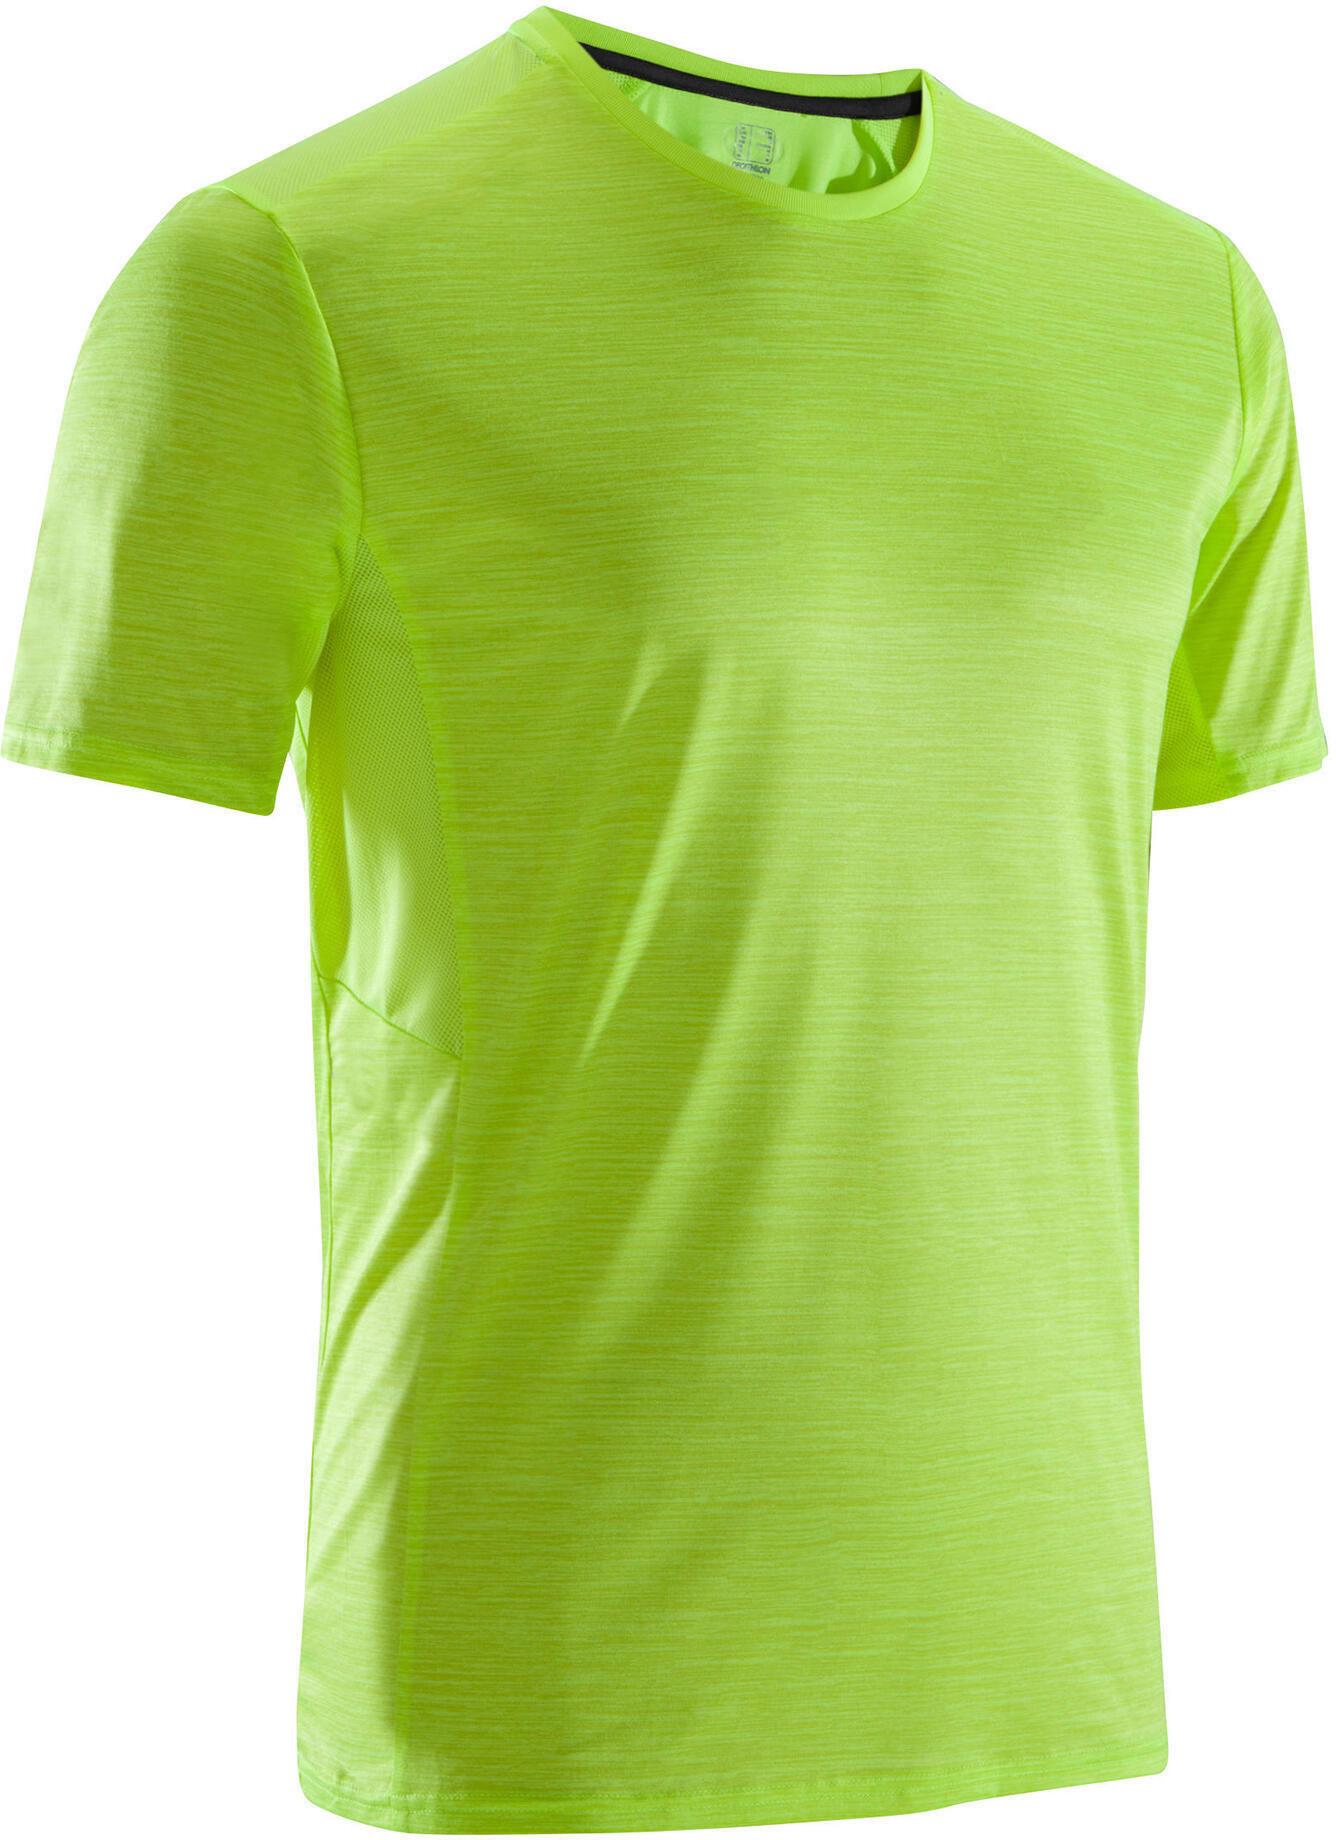 Koszulka do biegania męska Kalenji Run Dry+